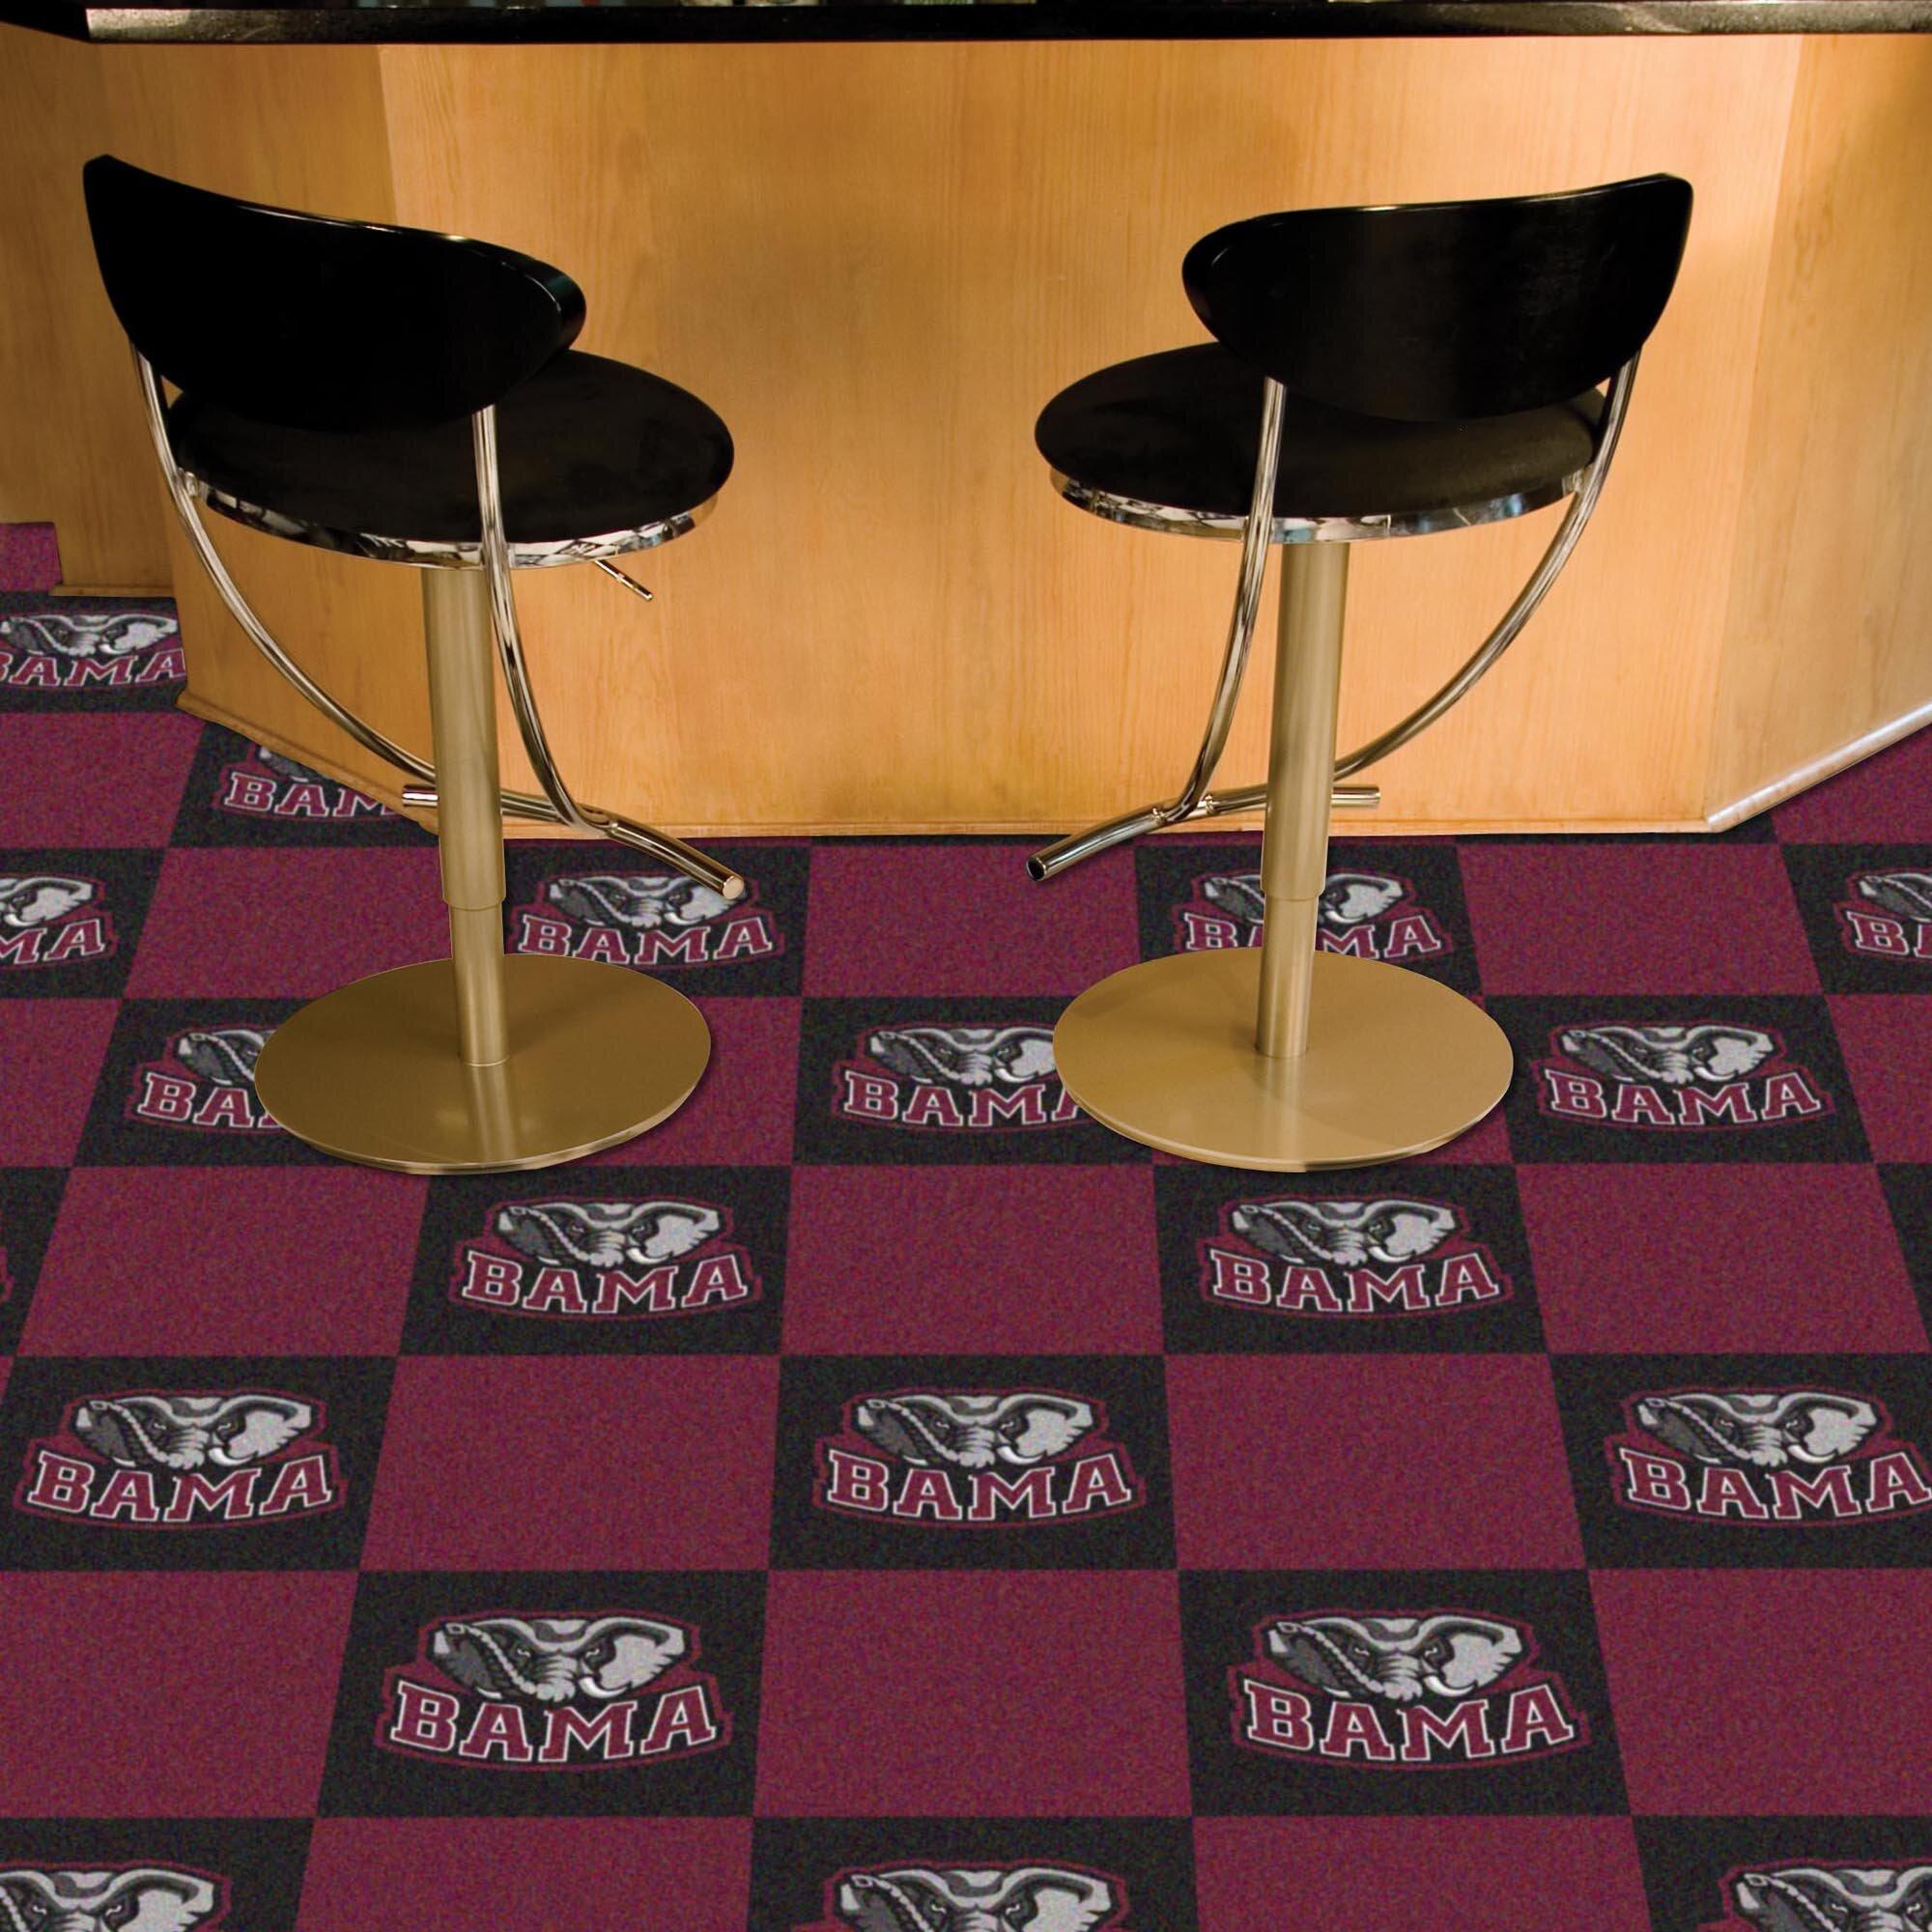 Fanmats Collegiate 18 Quot X 18 Quot Carpet Tiles In Multi Colored